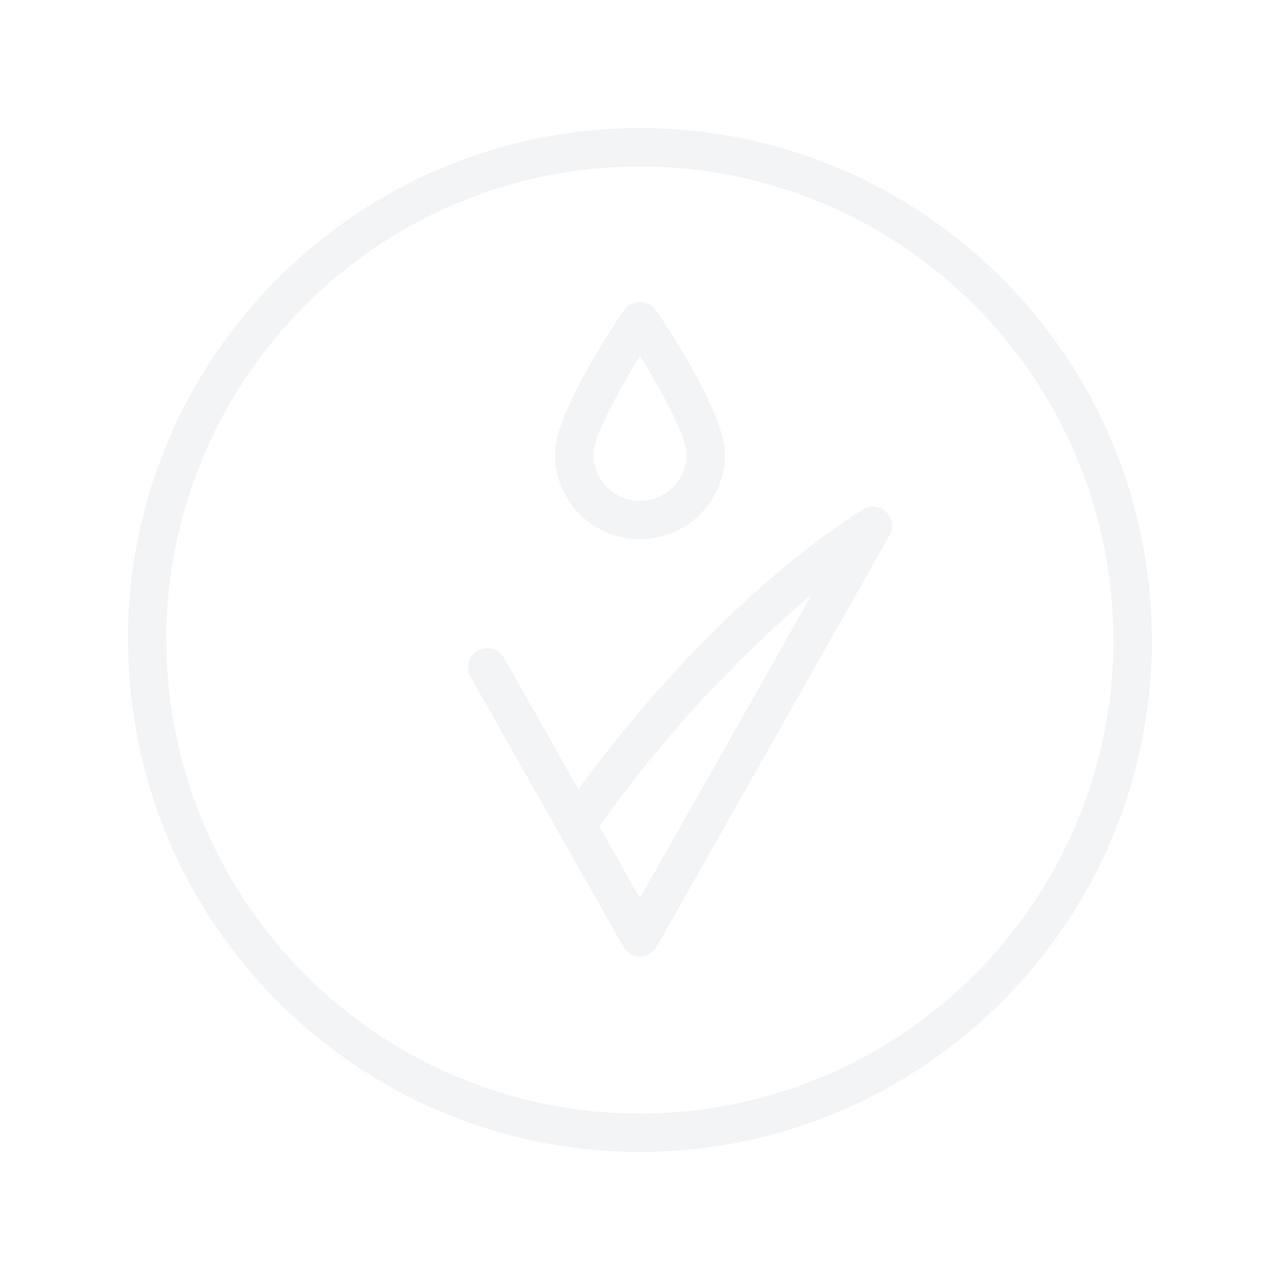 BIODERMA Photoderm Moisturising Tanning Spray 150ml